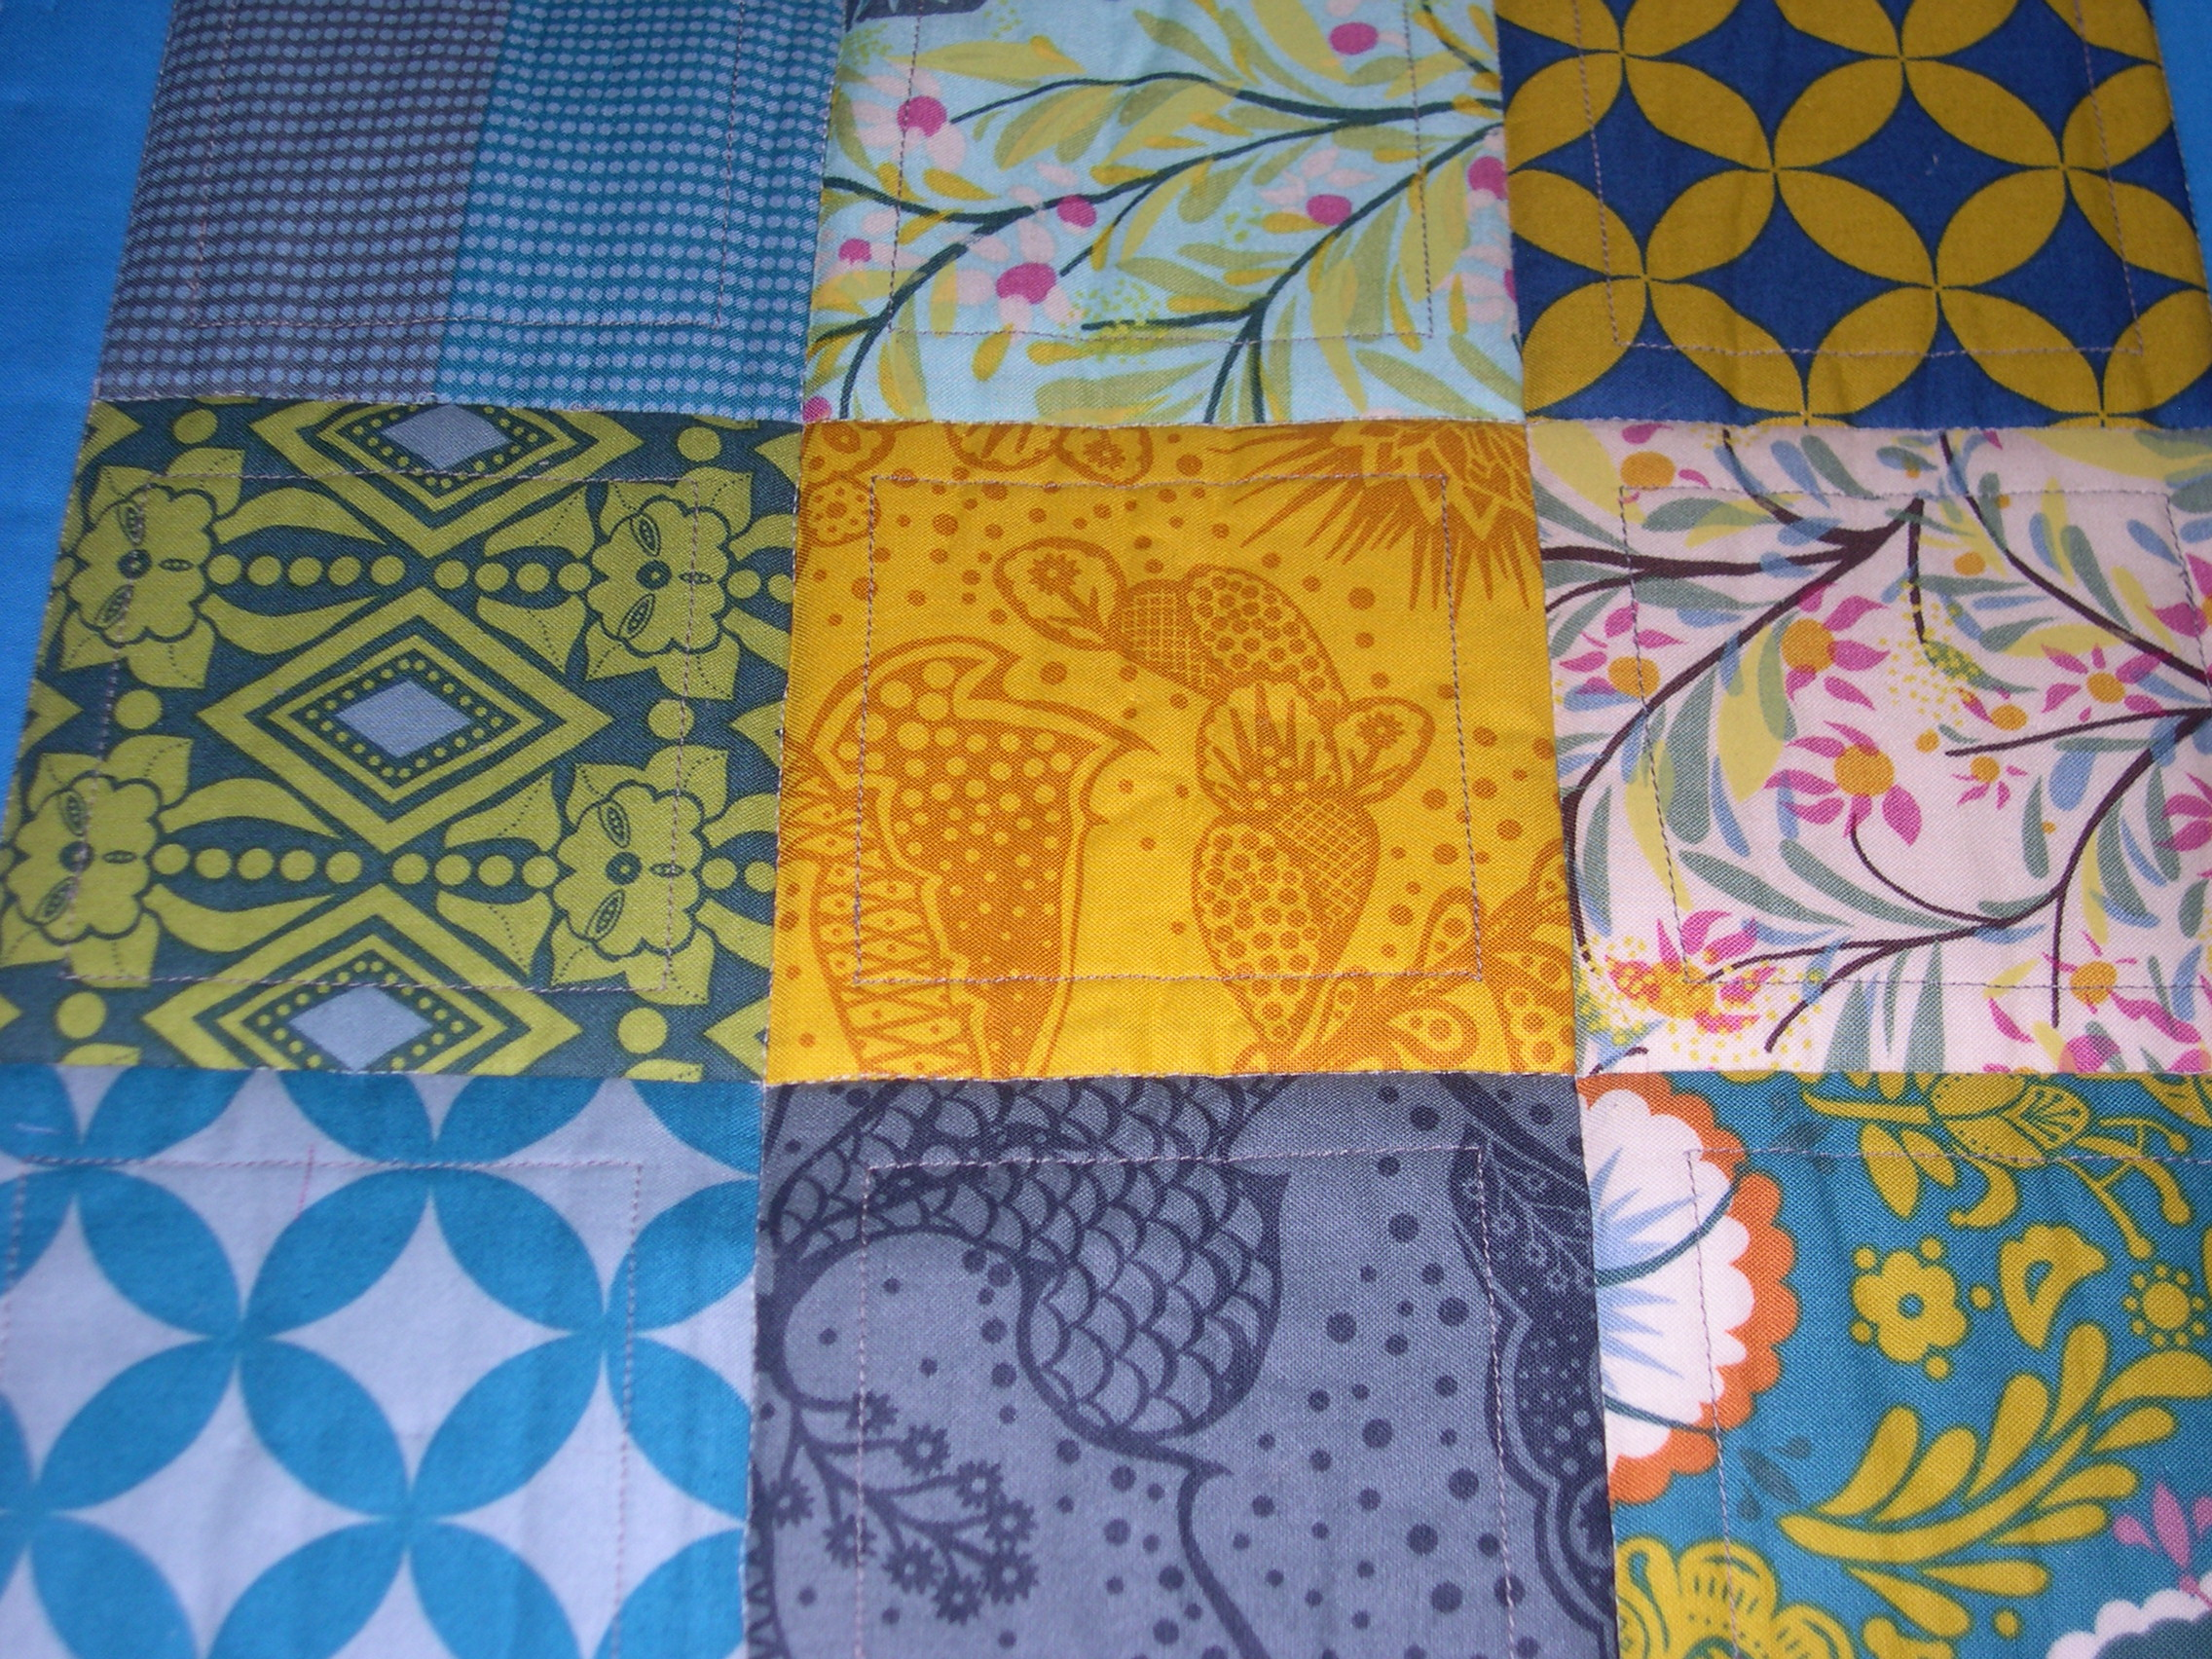 Good Folks patchwork